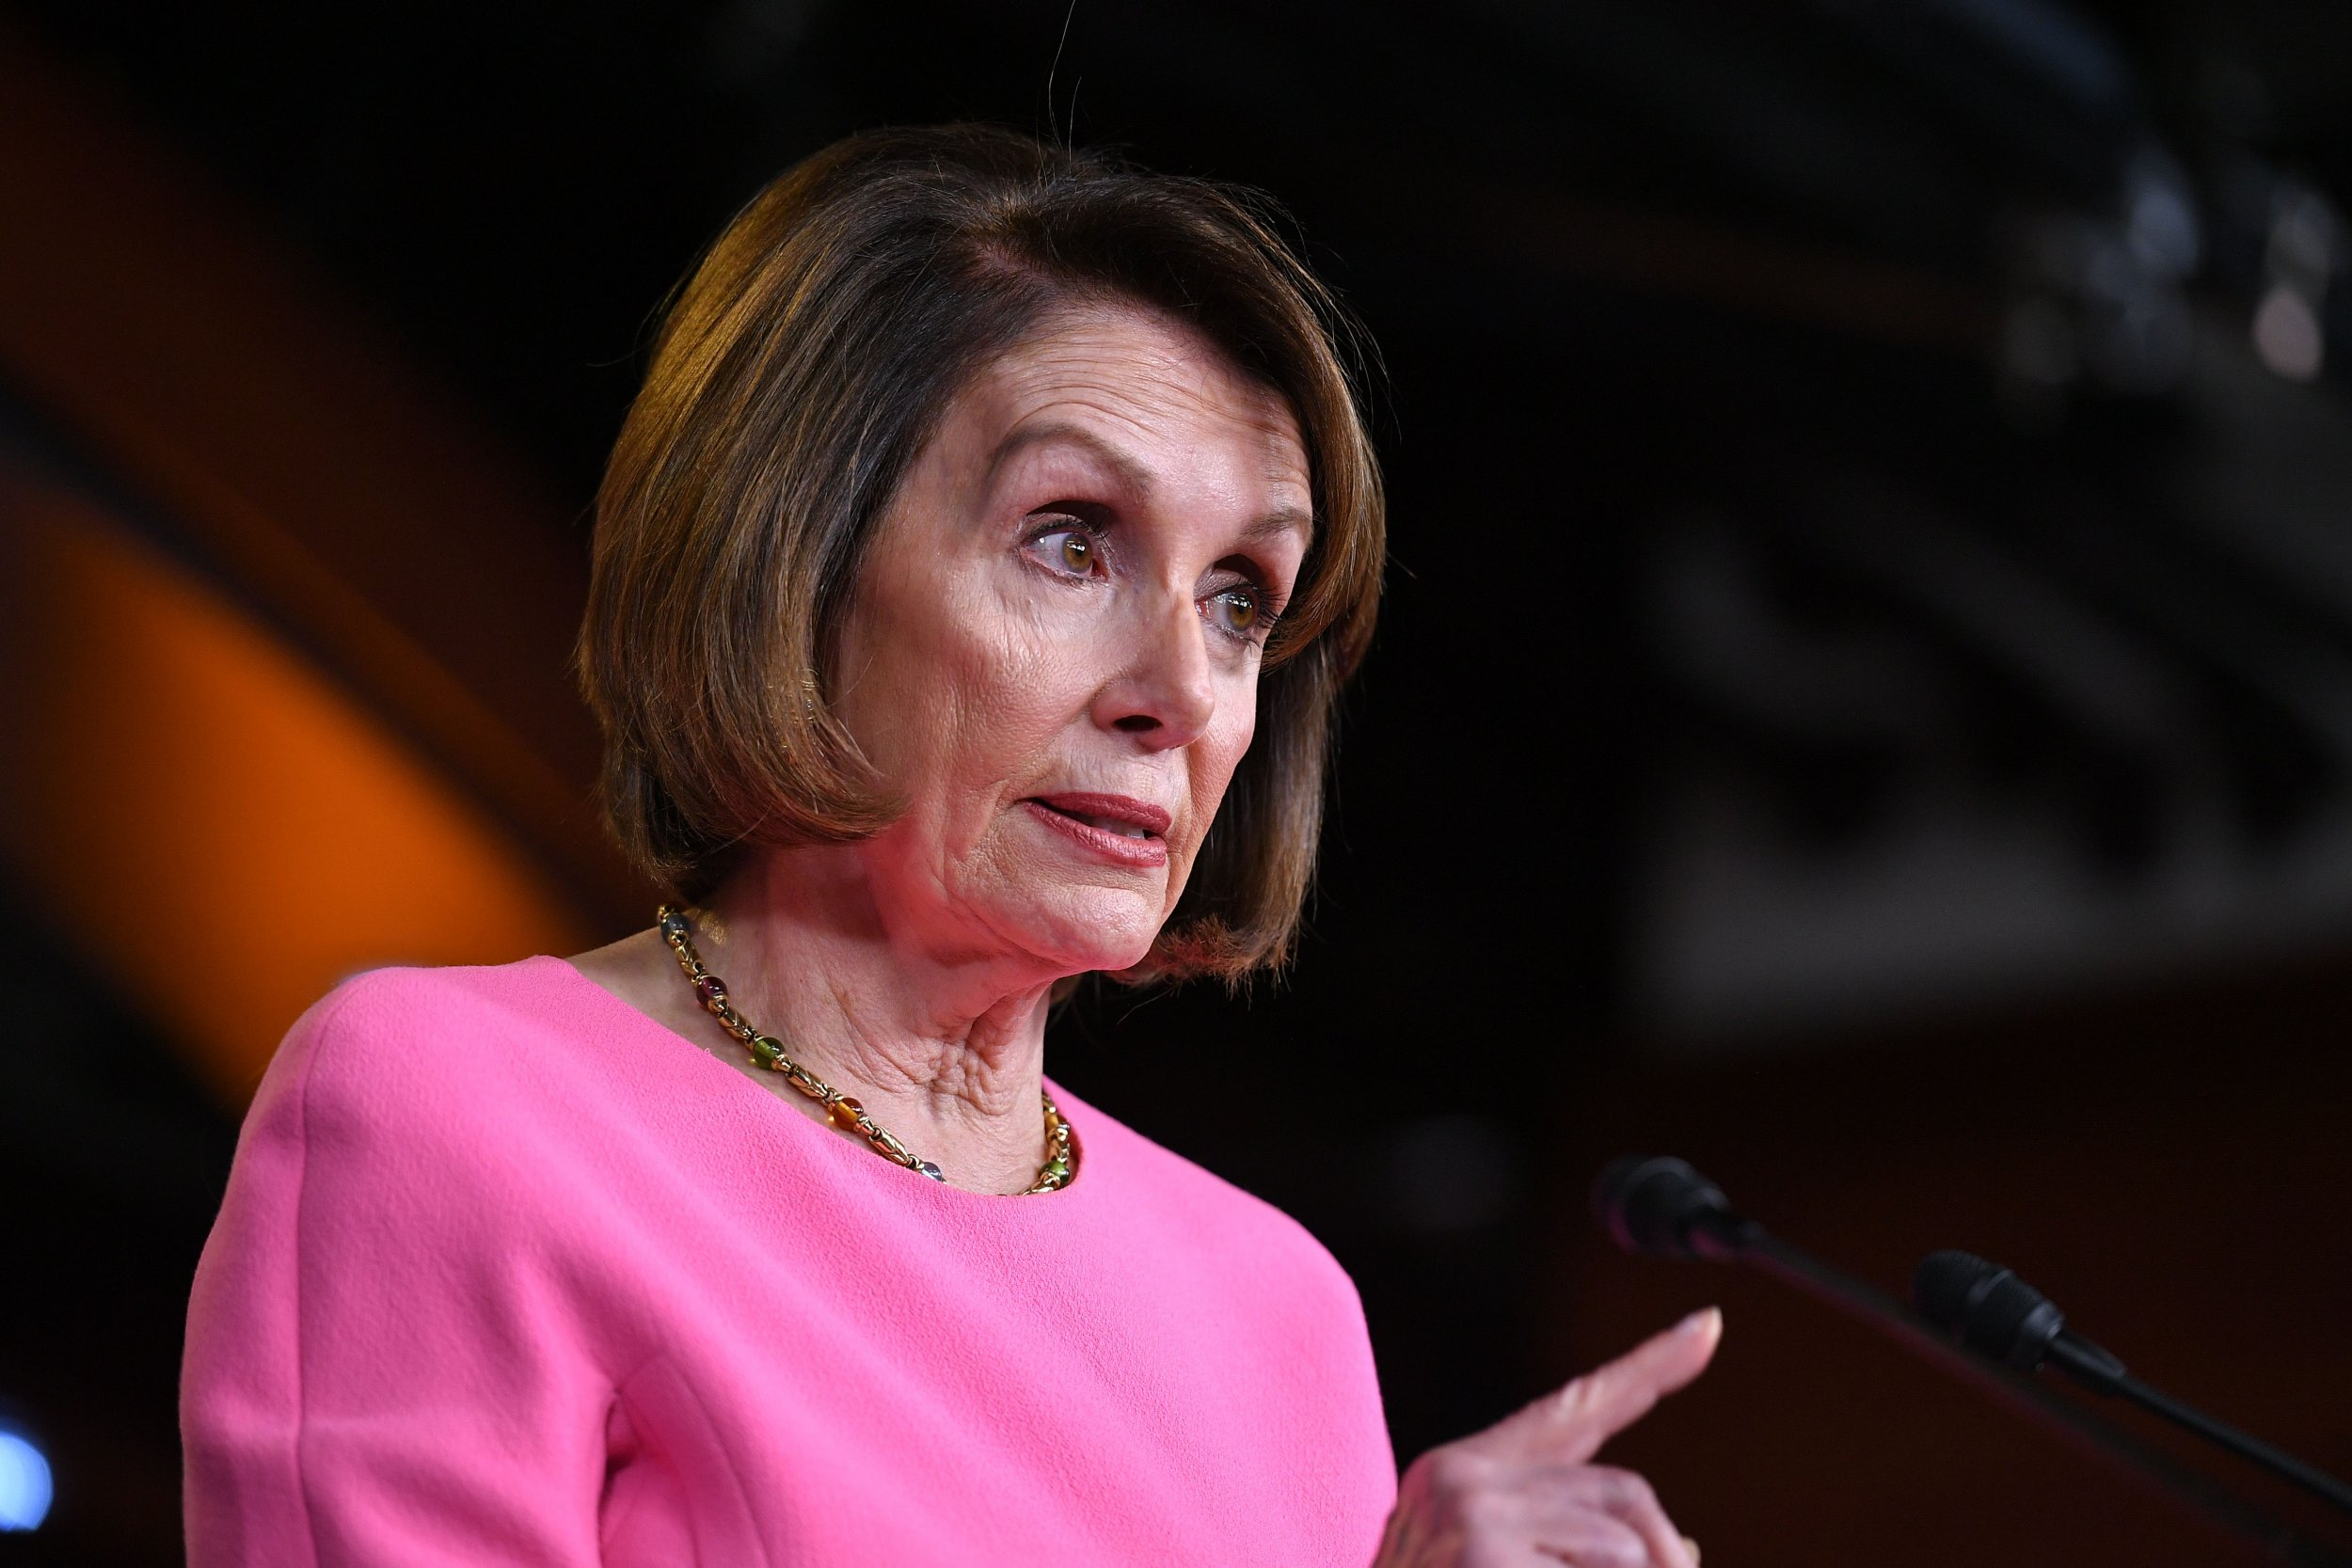 Nancy Pelosi, Trump needs an intervention